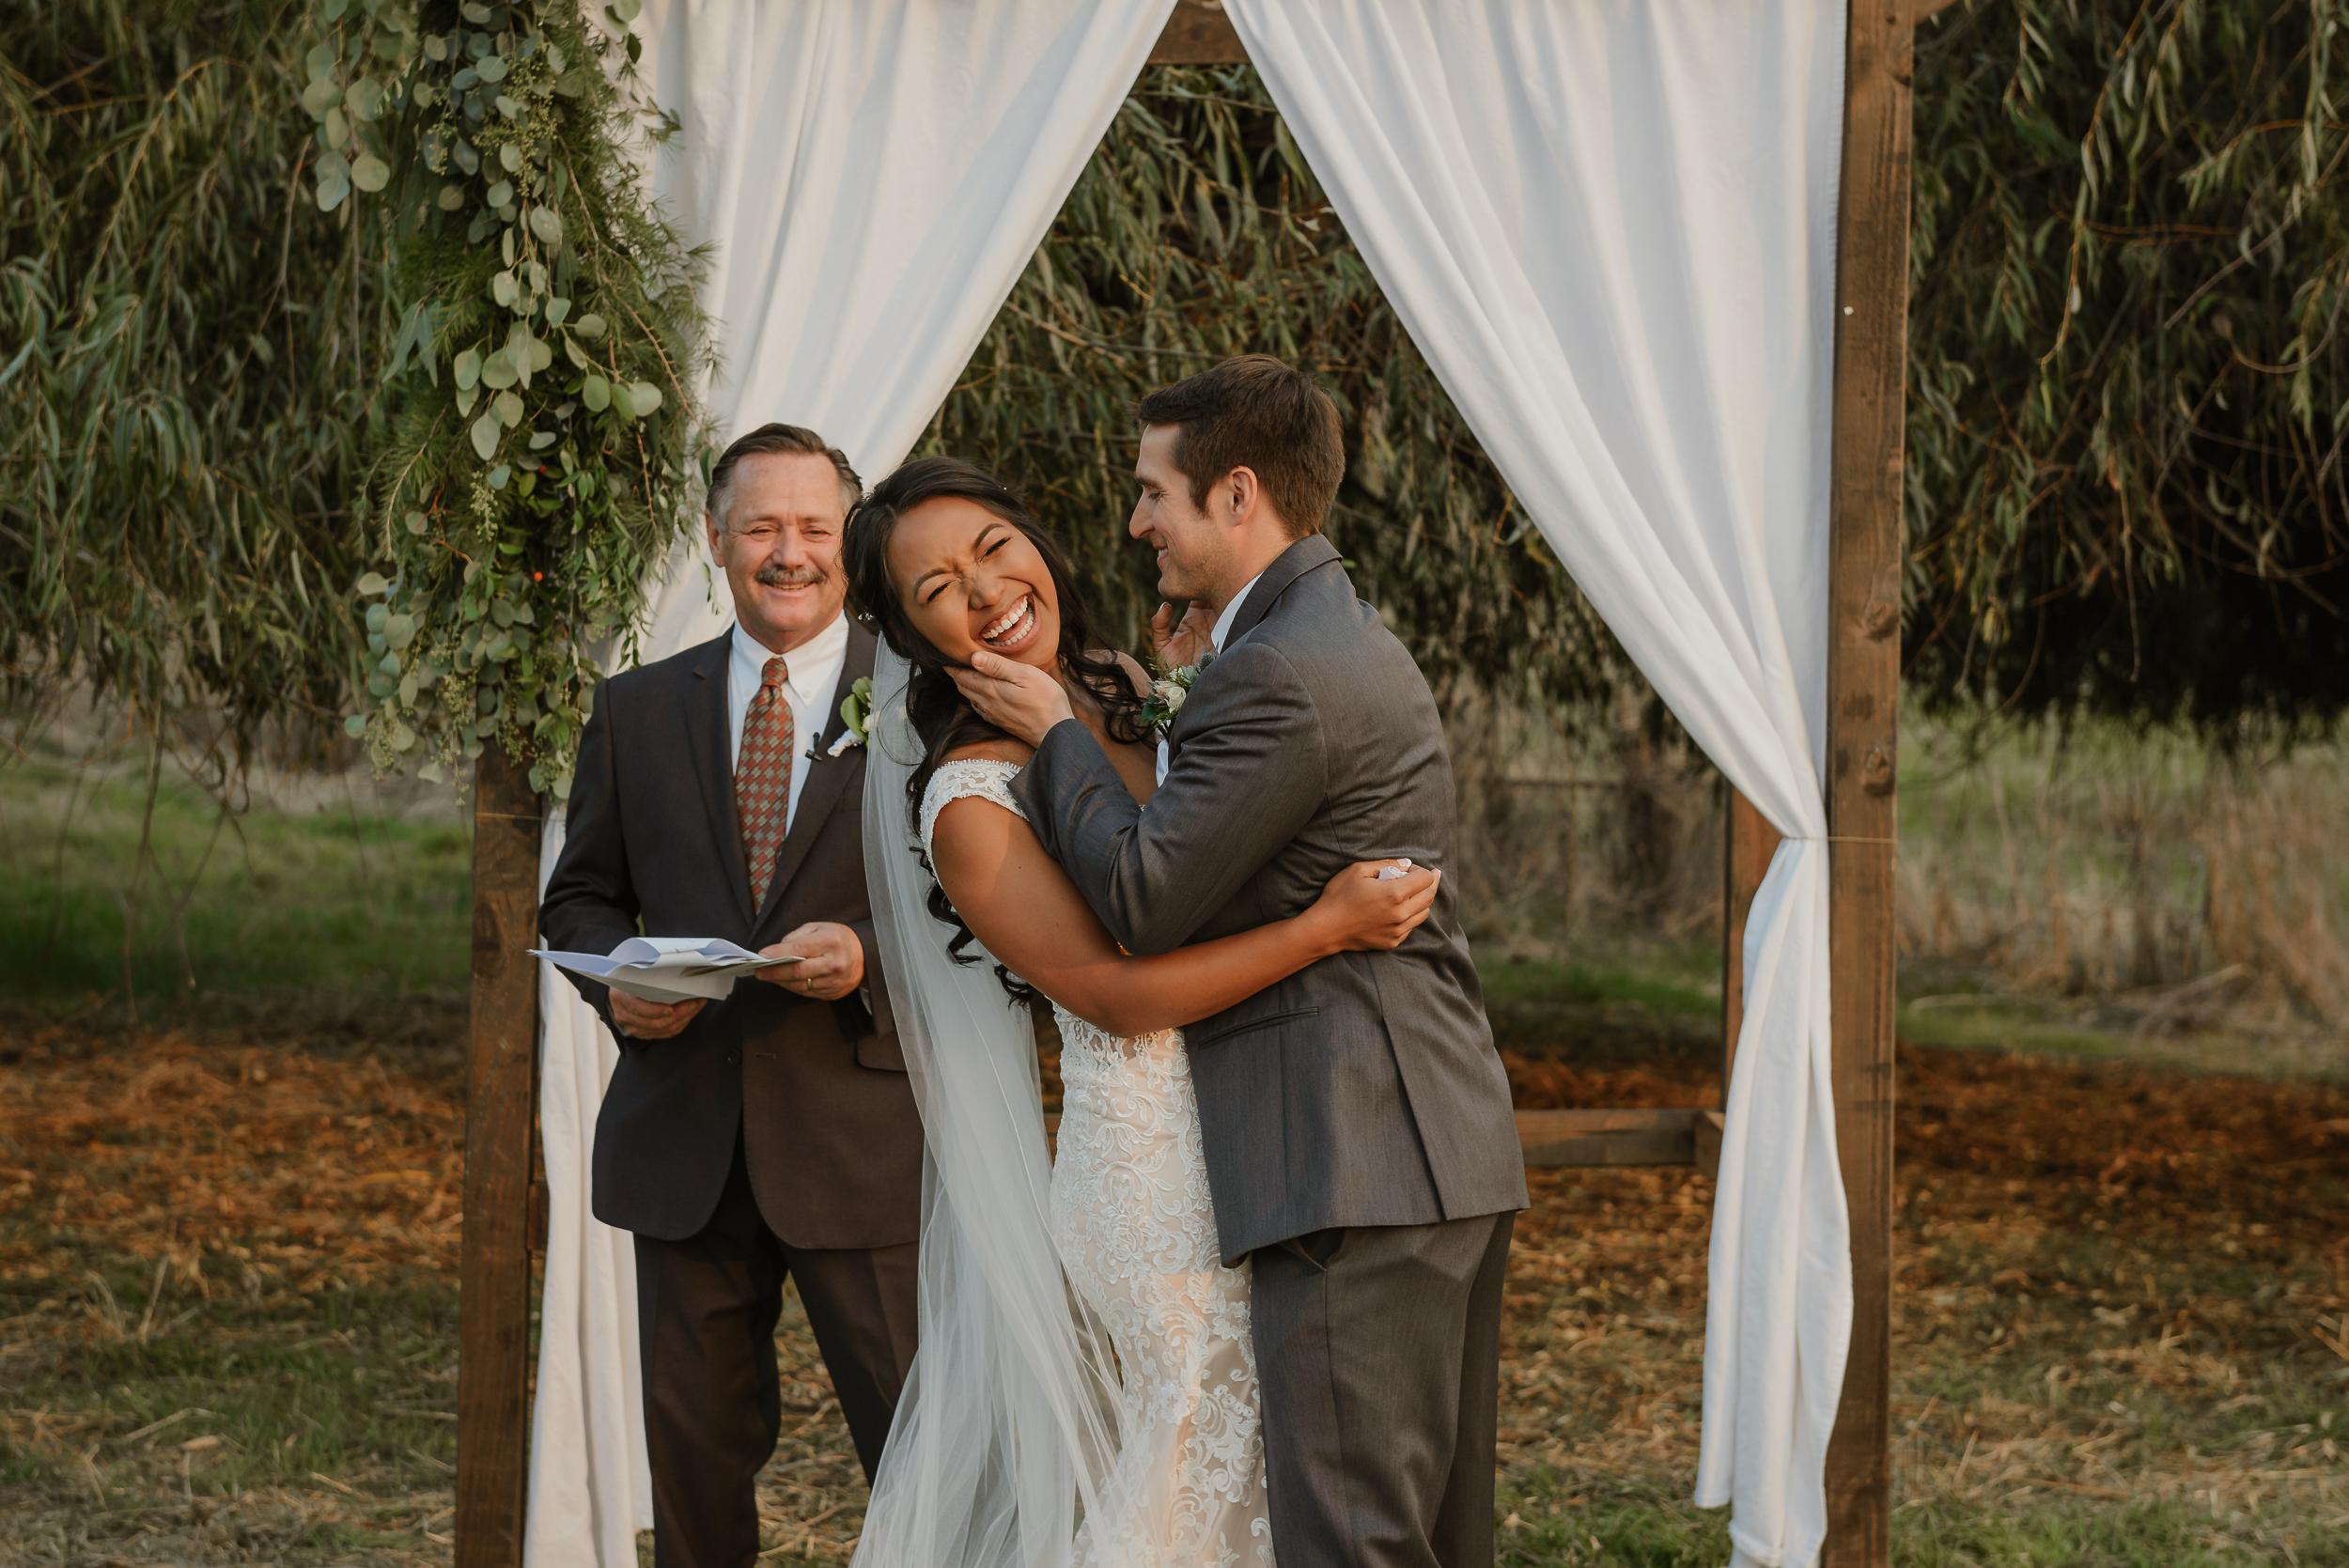 053marin-petaluma-backyard-wedding-vivianchen-341.jpg